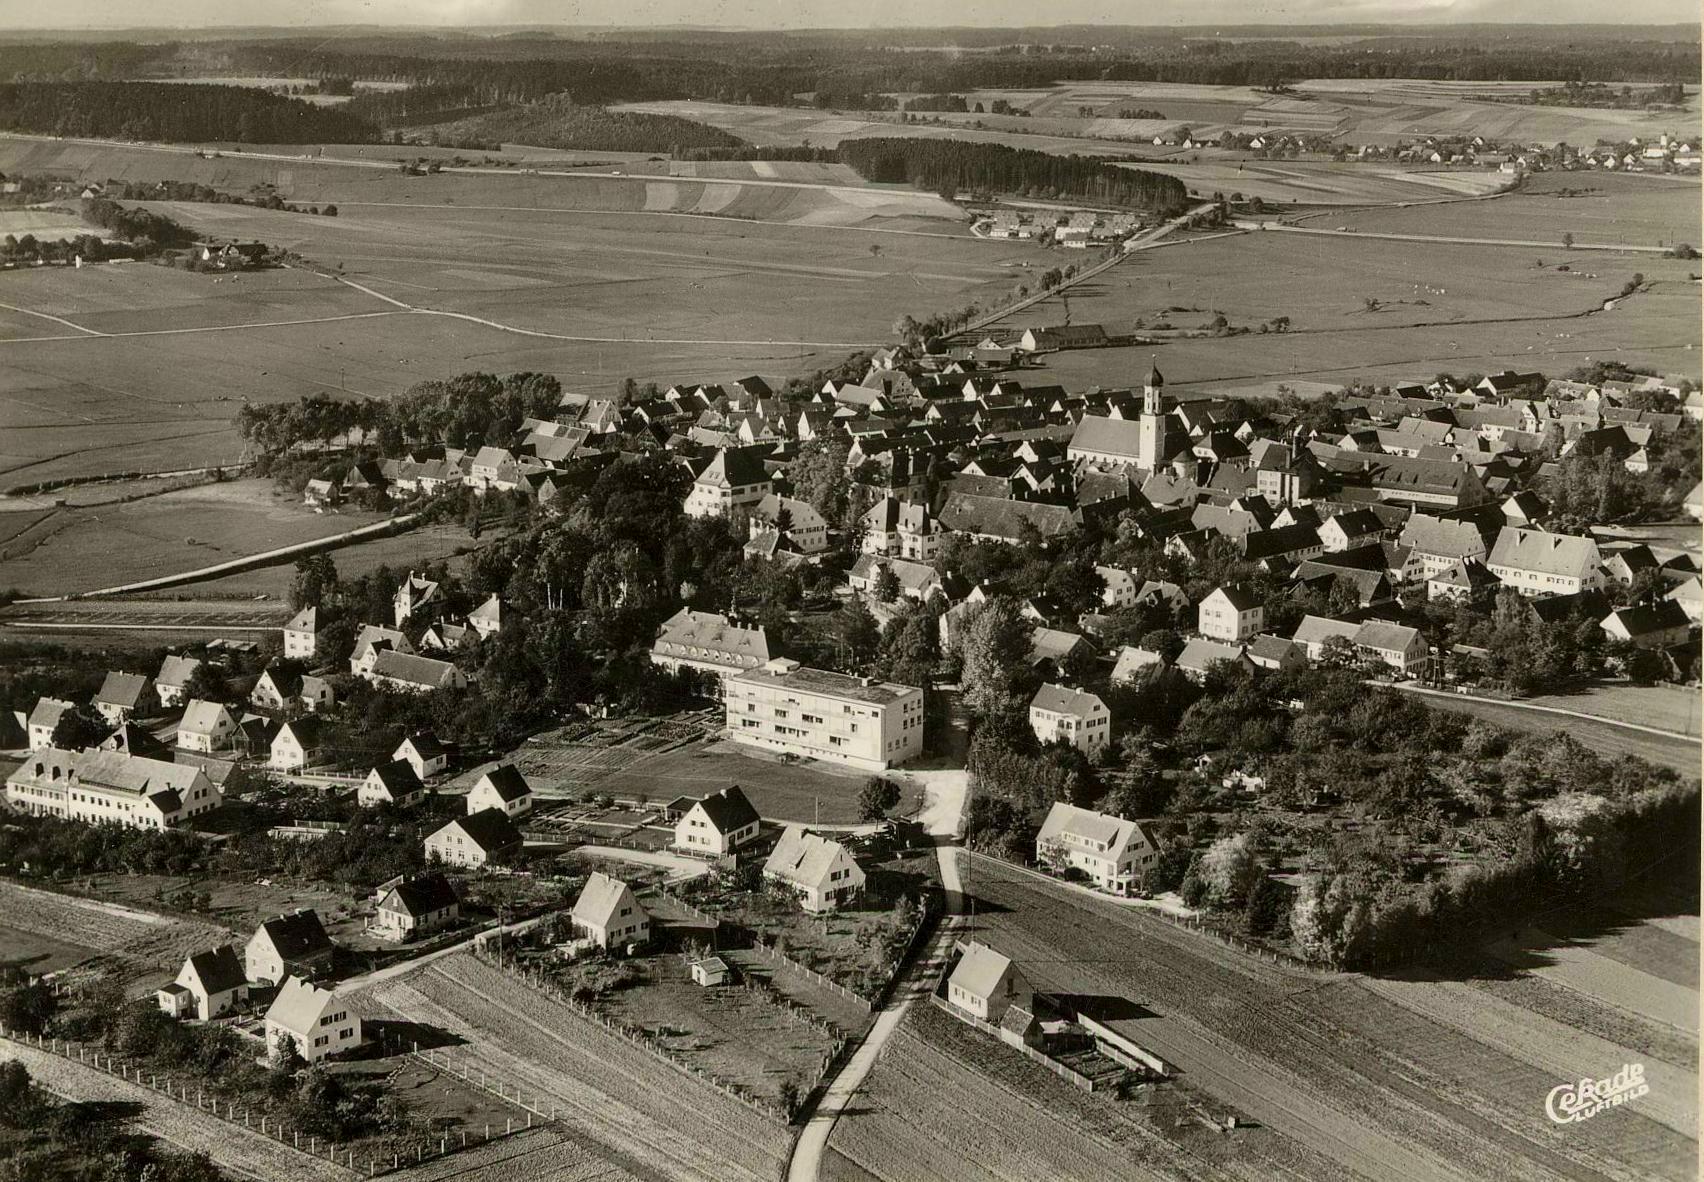 Zusmarshausen Luftbild